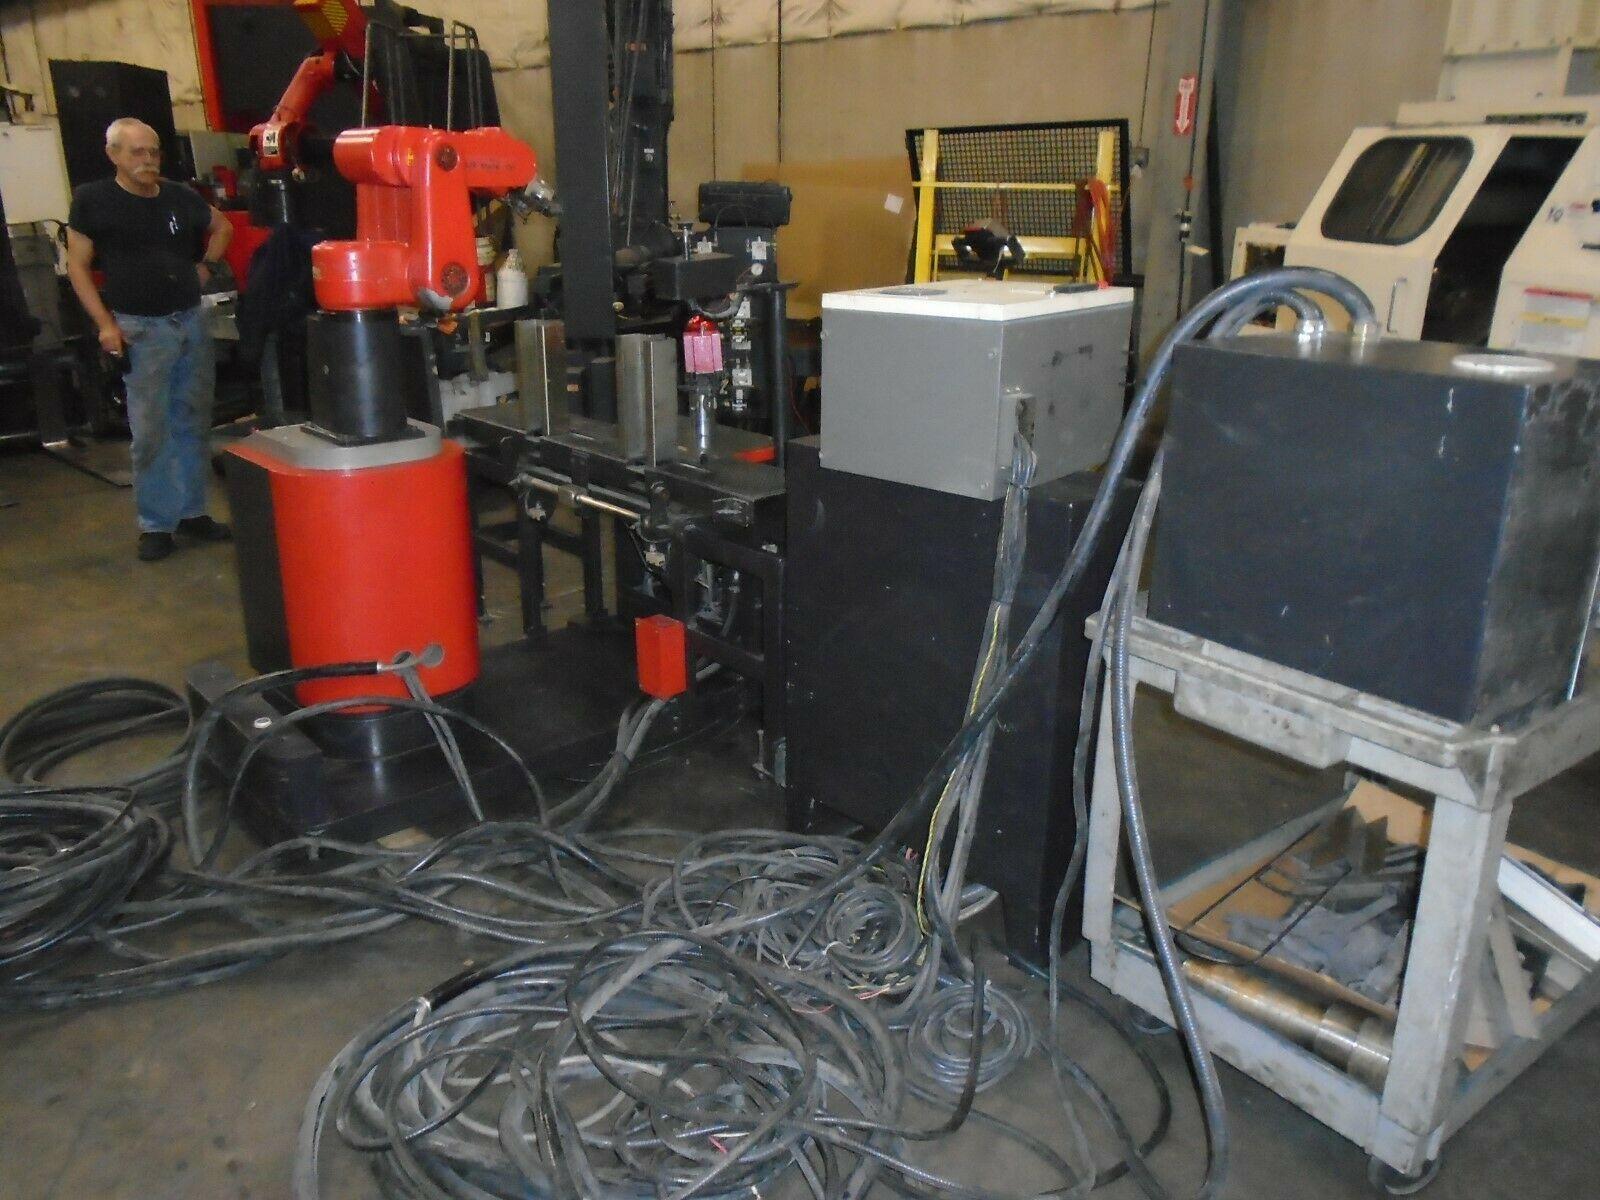 Fanuc Robot LR Mate 100 A5B-1131-8001 Mini Cel R-J2 Control - Image 2 of 12